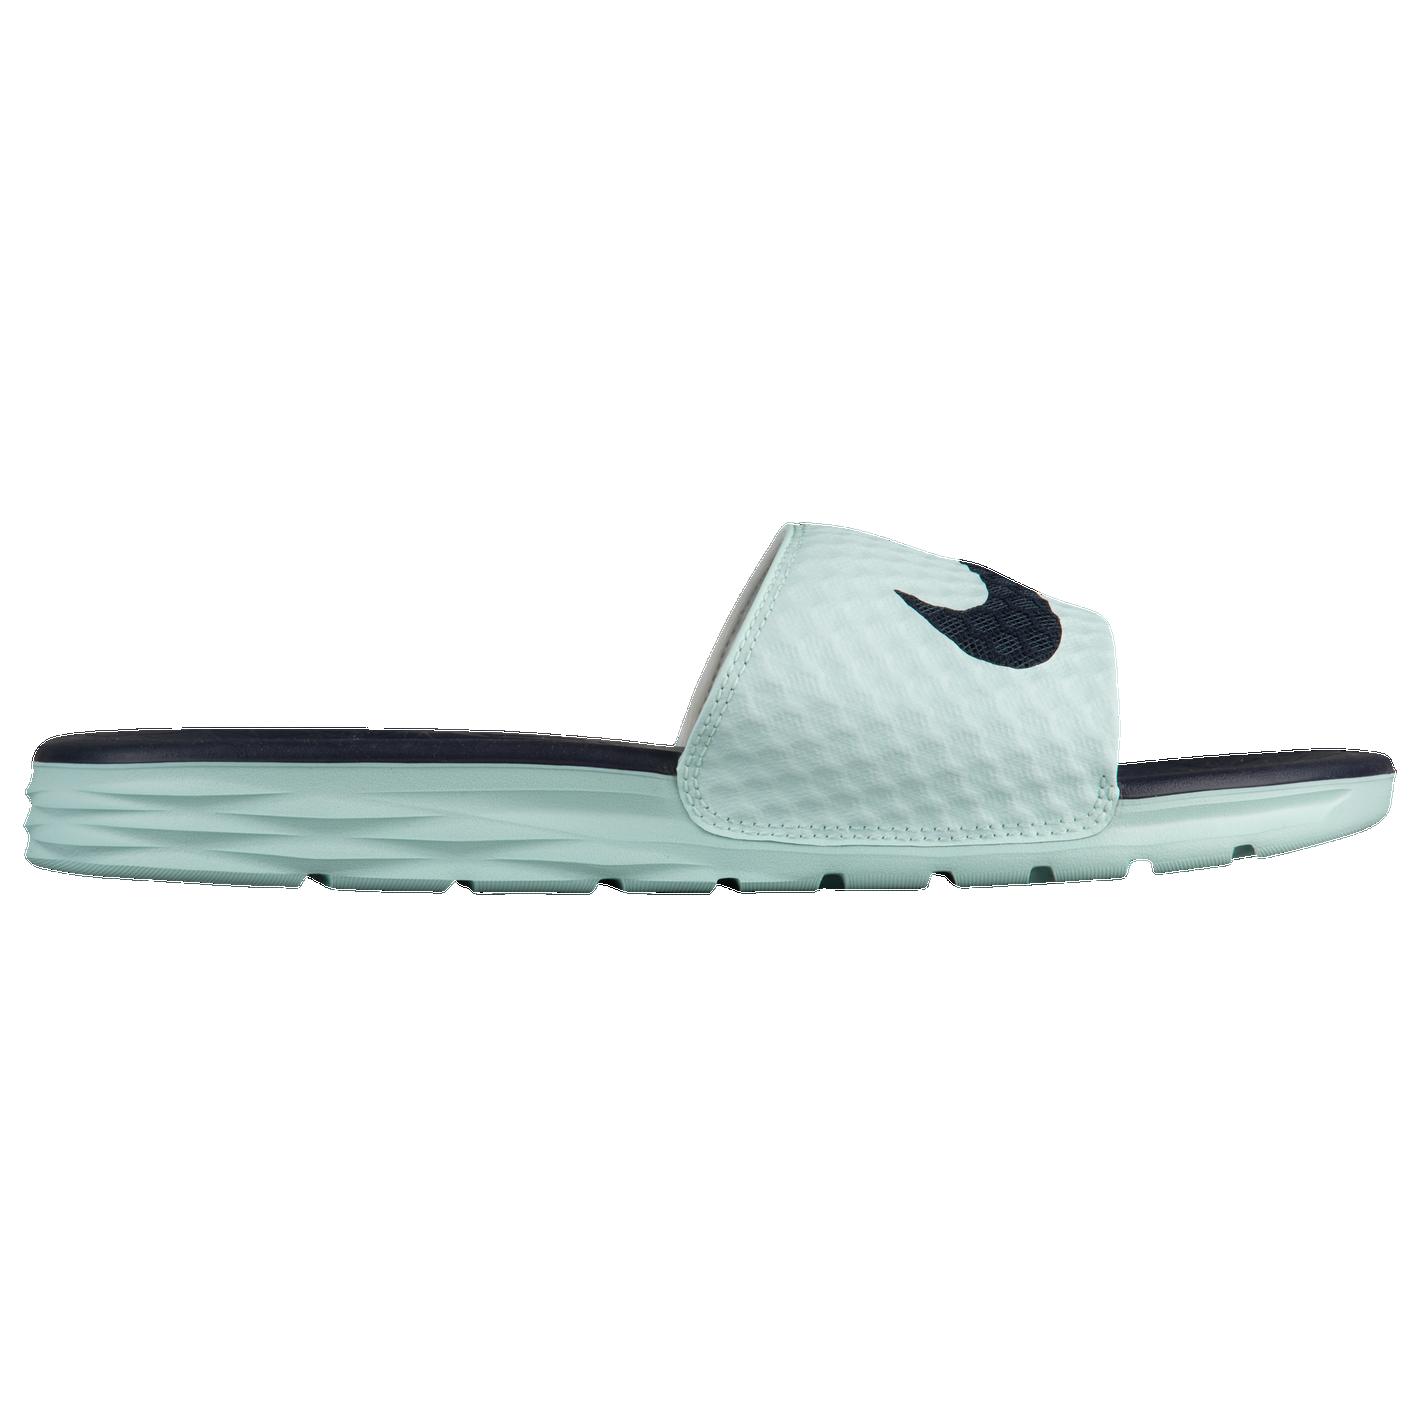 b51b2f1a983 Nike Benassi Solarsoft Slide 2 - Women s - Casual - Shoes - Igloo ...